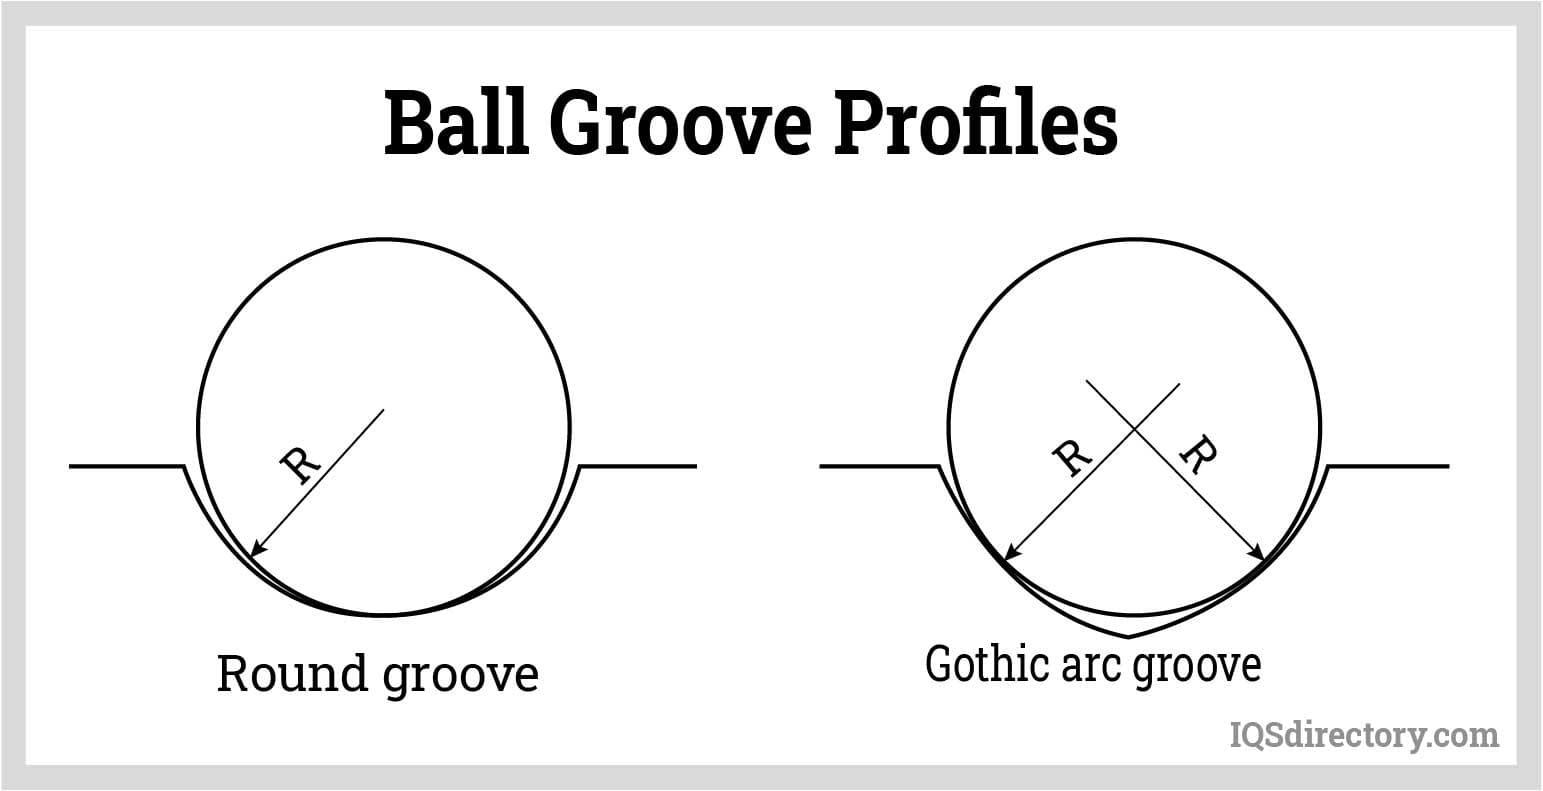 Ball Groove Profiles